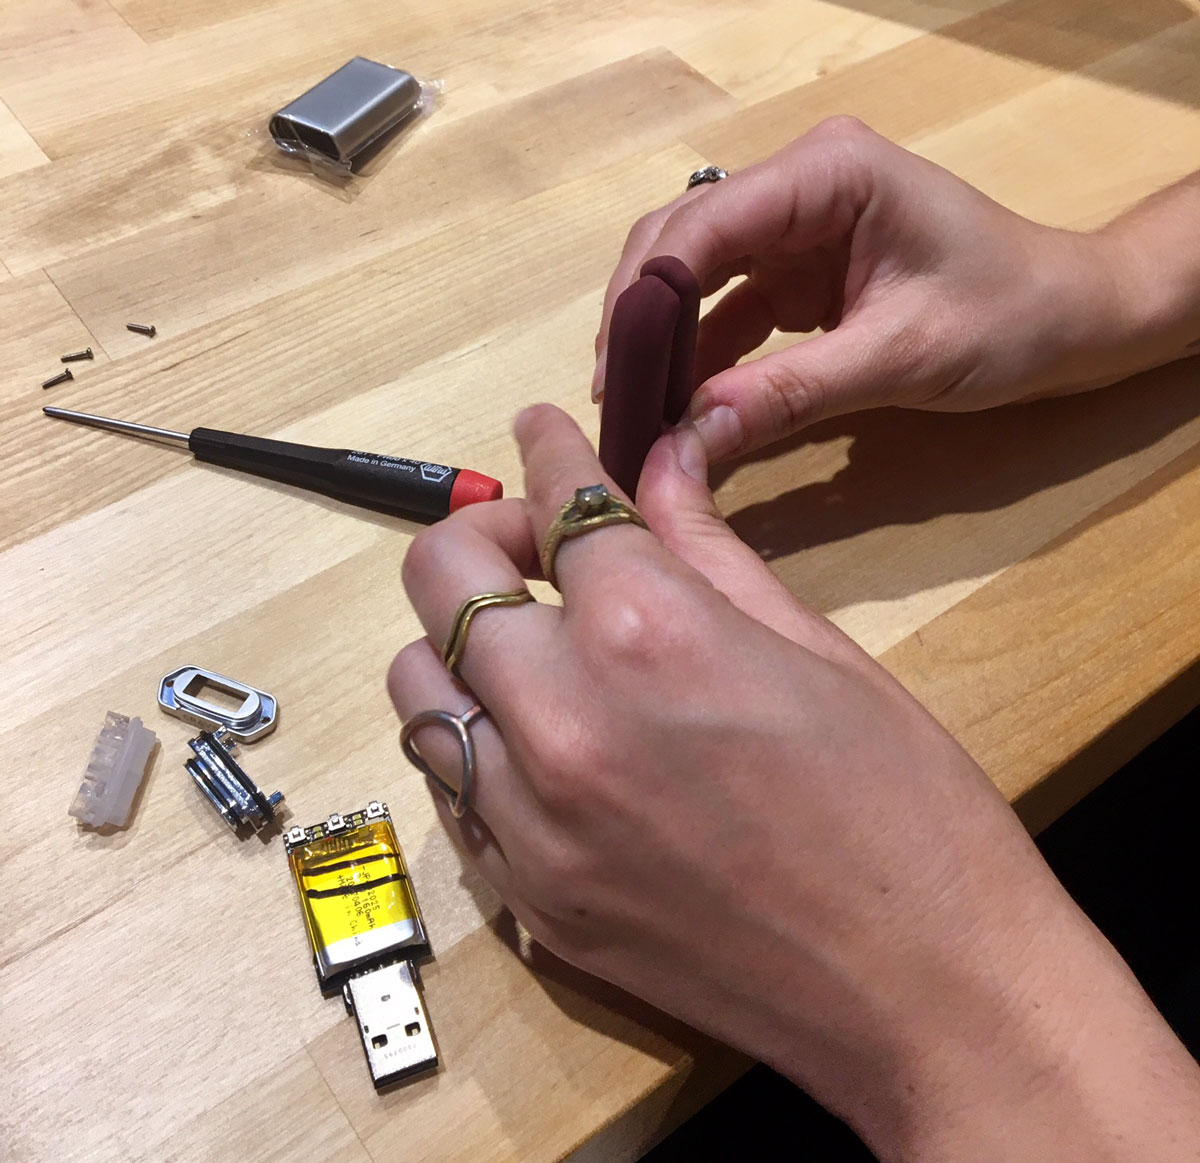 Build a vibrator